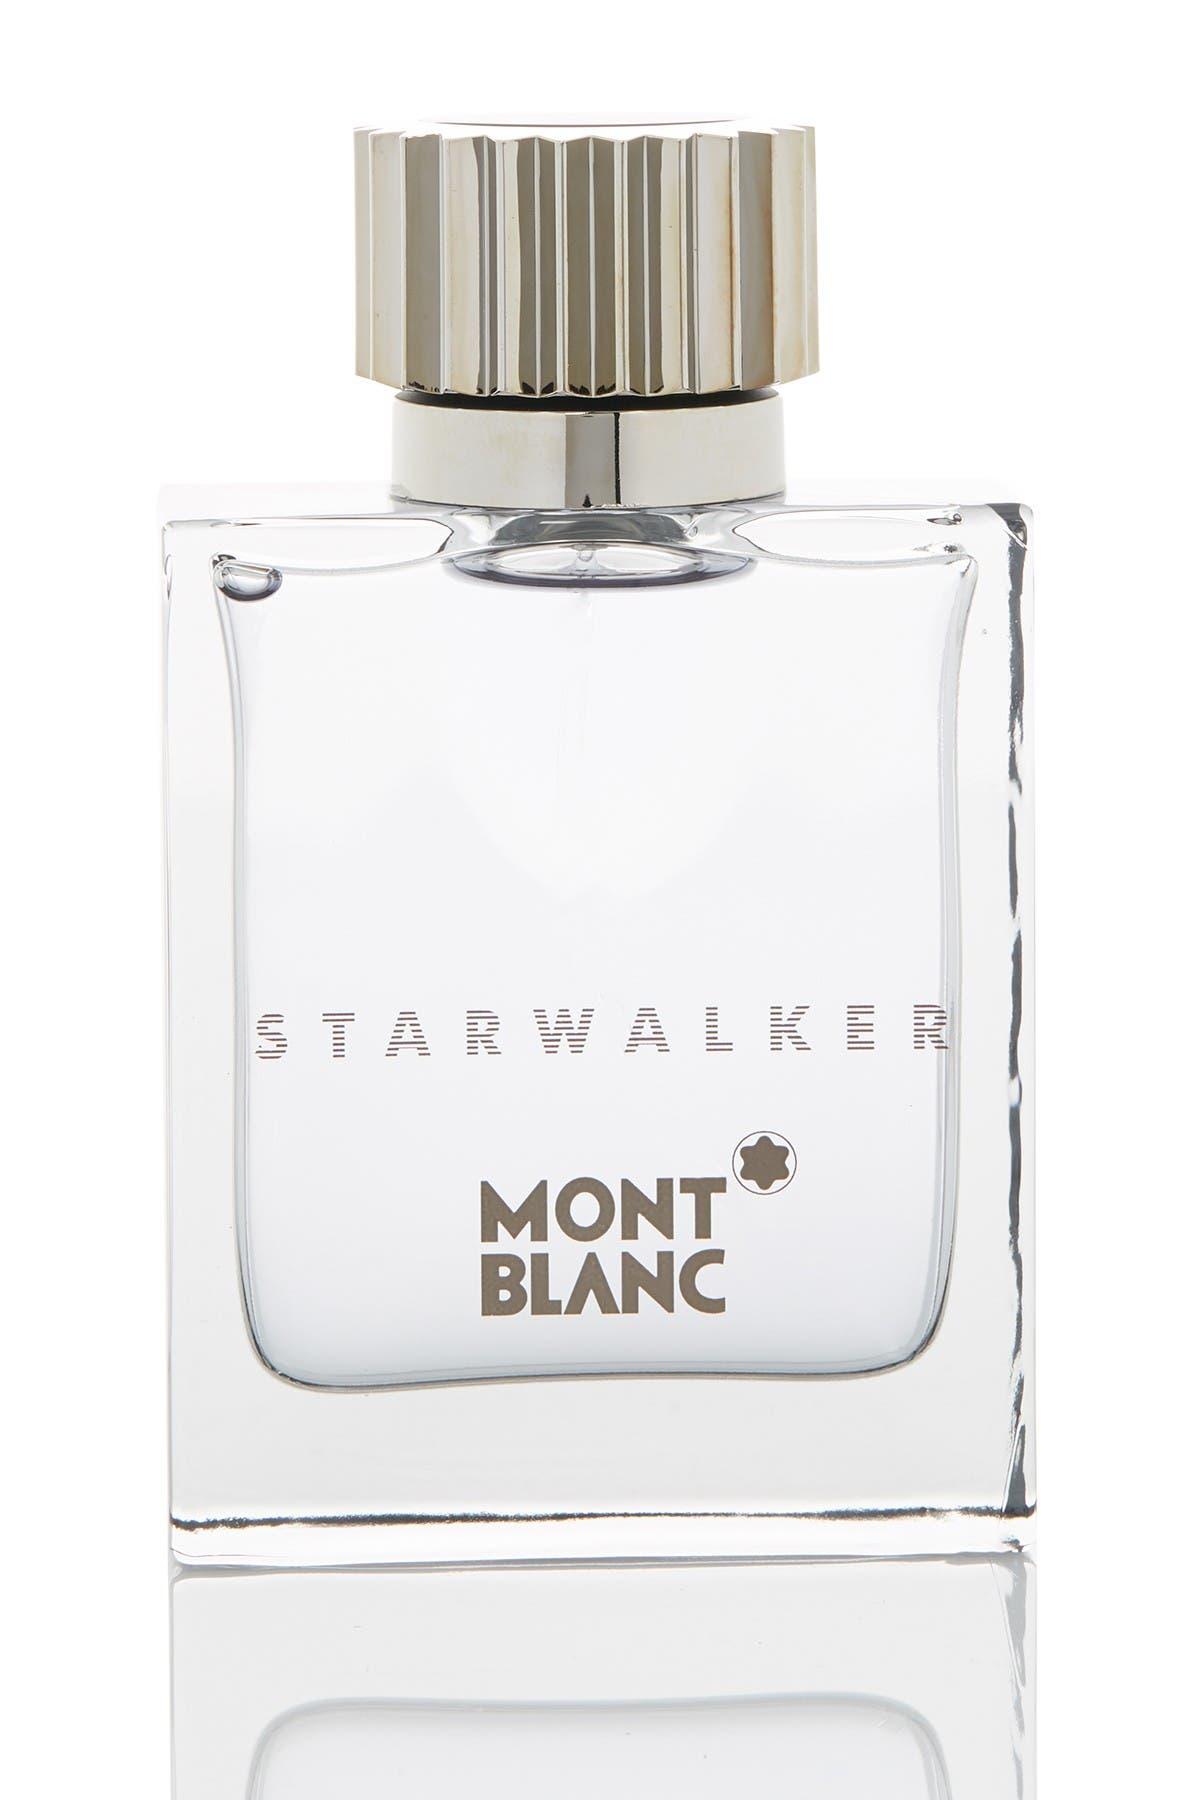 Image of Jimmy Choo Starwalker by Montblanc for Men - 1.7 oz